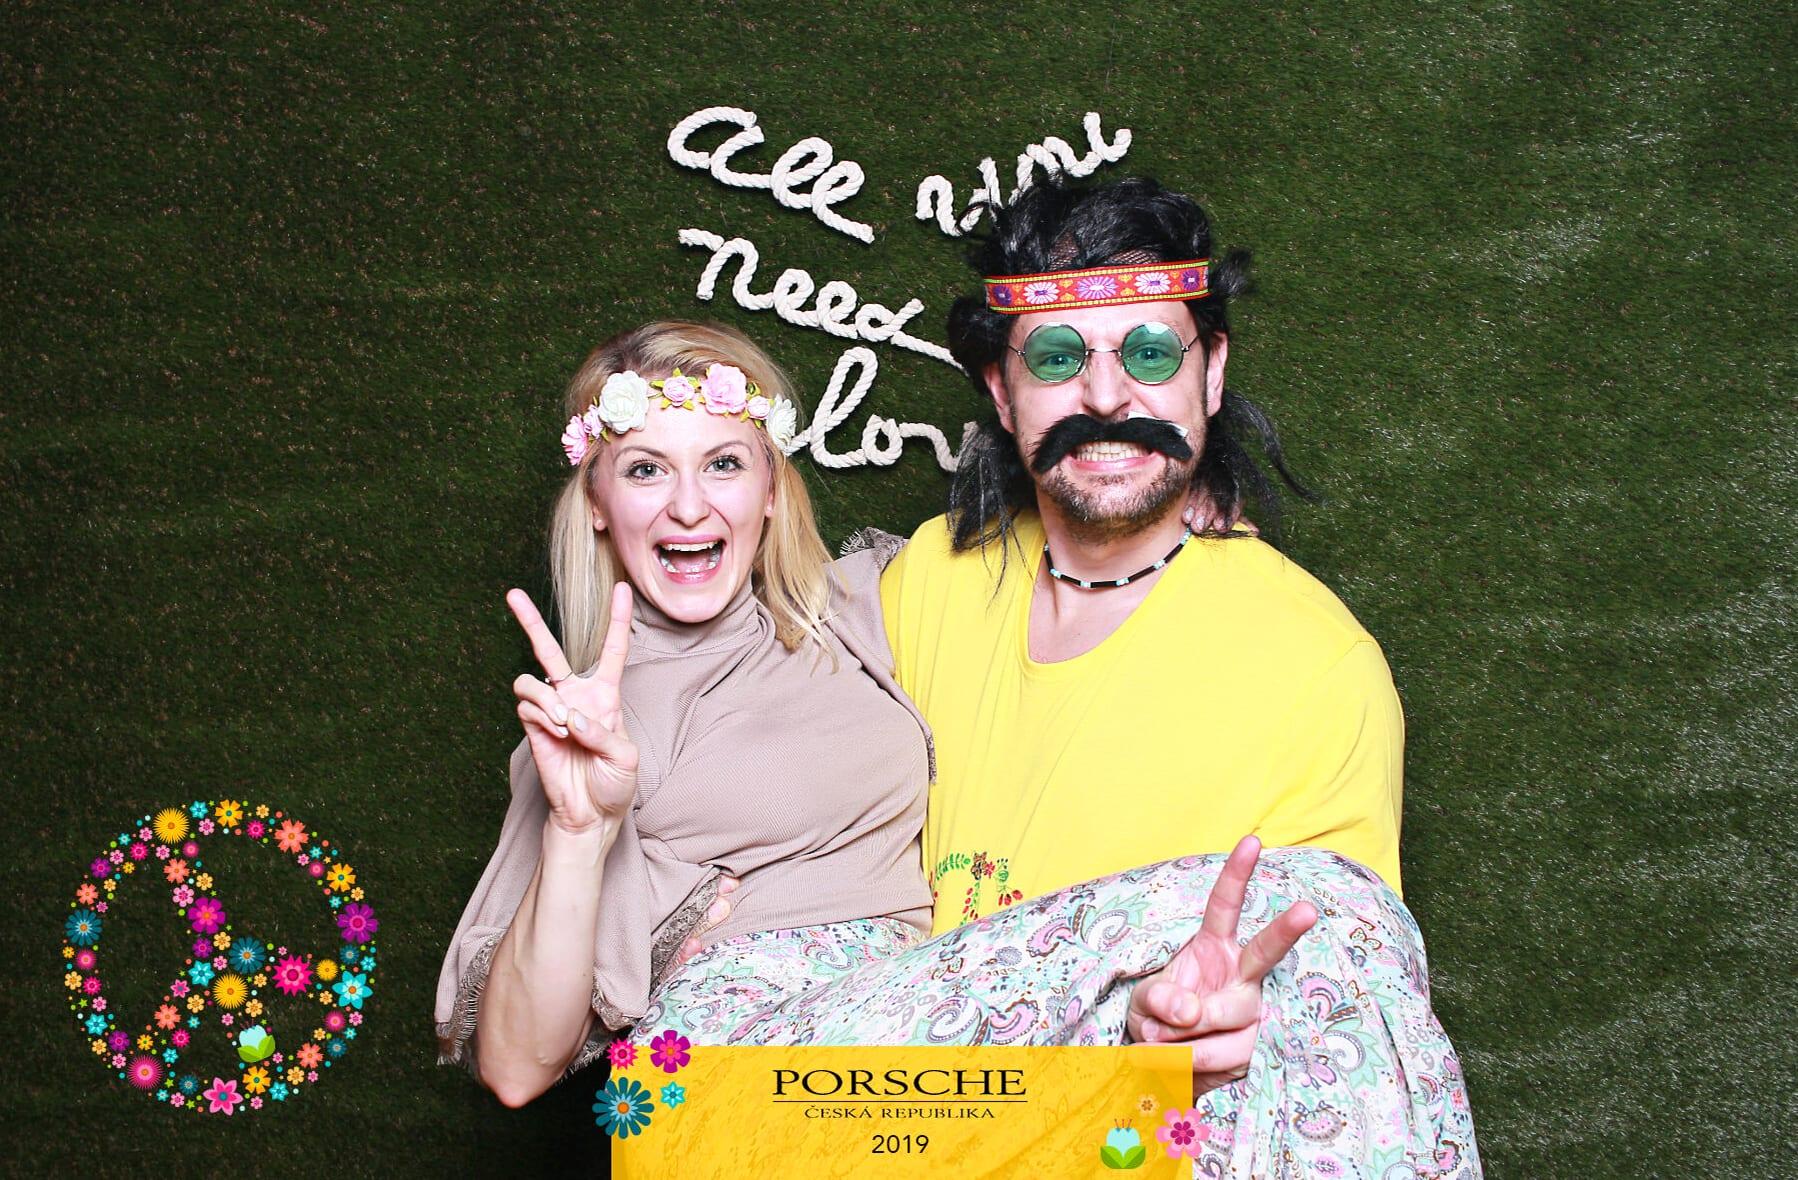 fotokoutek-firemni-vecirek-praha-vanocni-vecirek-porsche-18-12-2019-699975